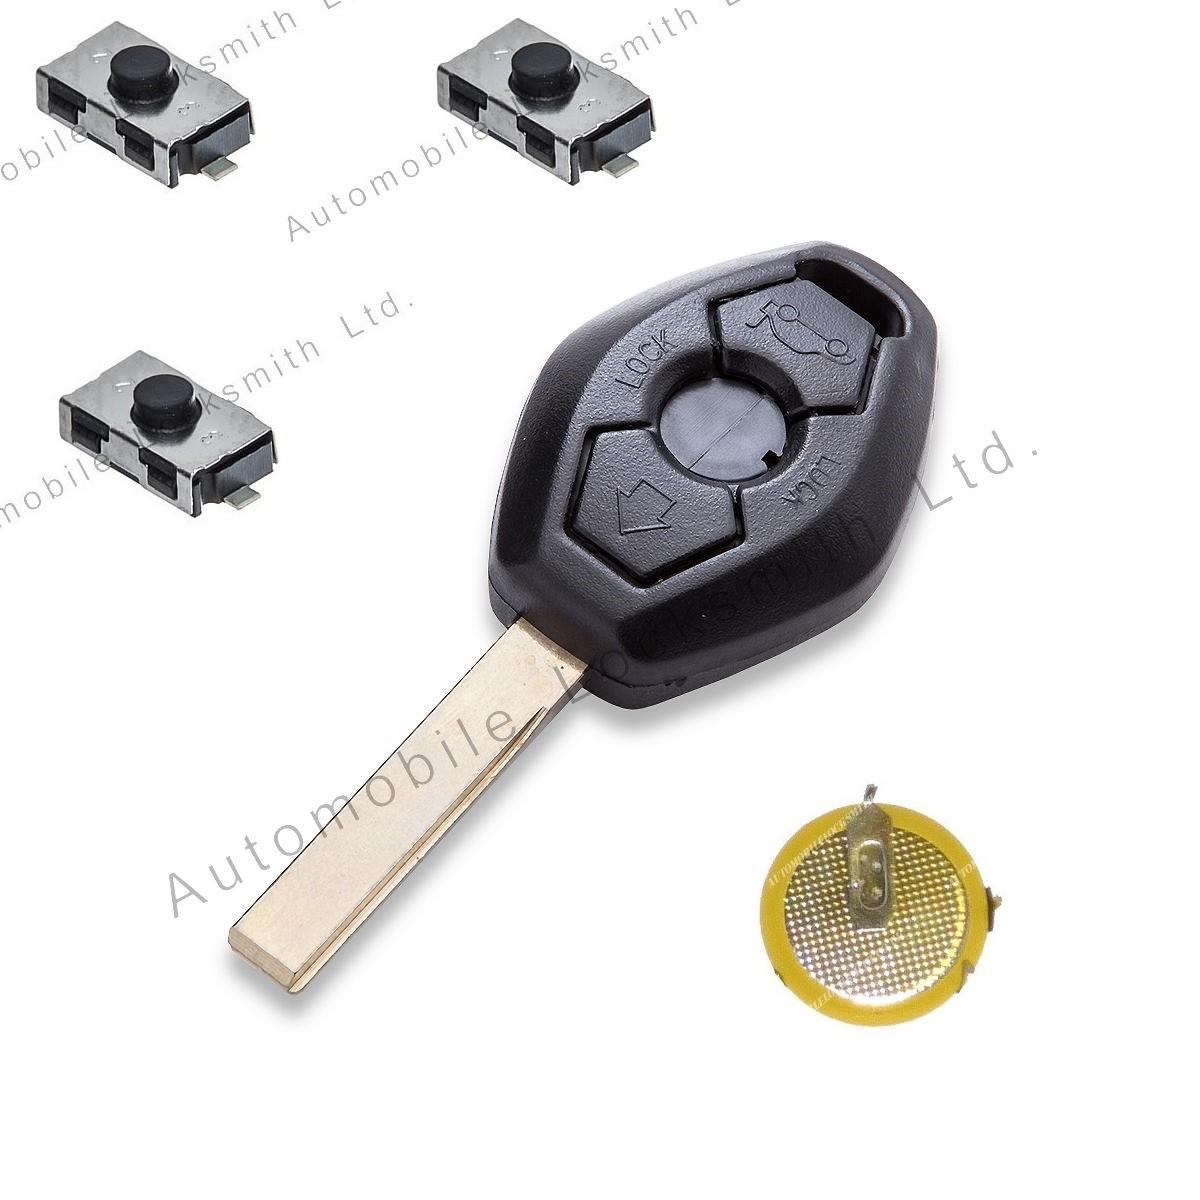 DIY Repair kit fot BMW 3 button remote key with HU92 blade